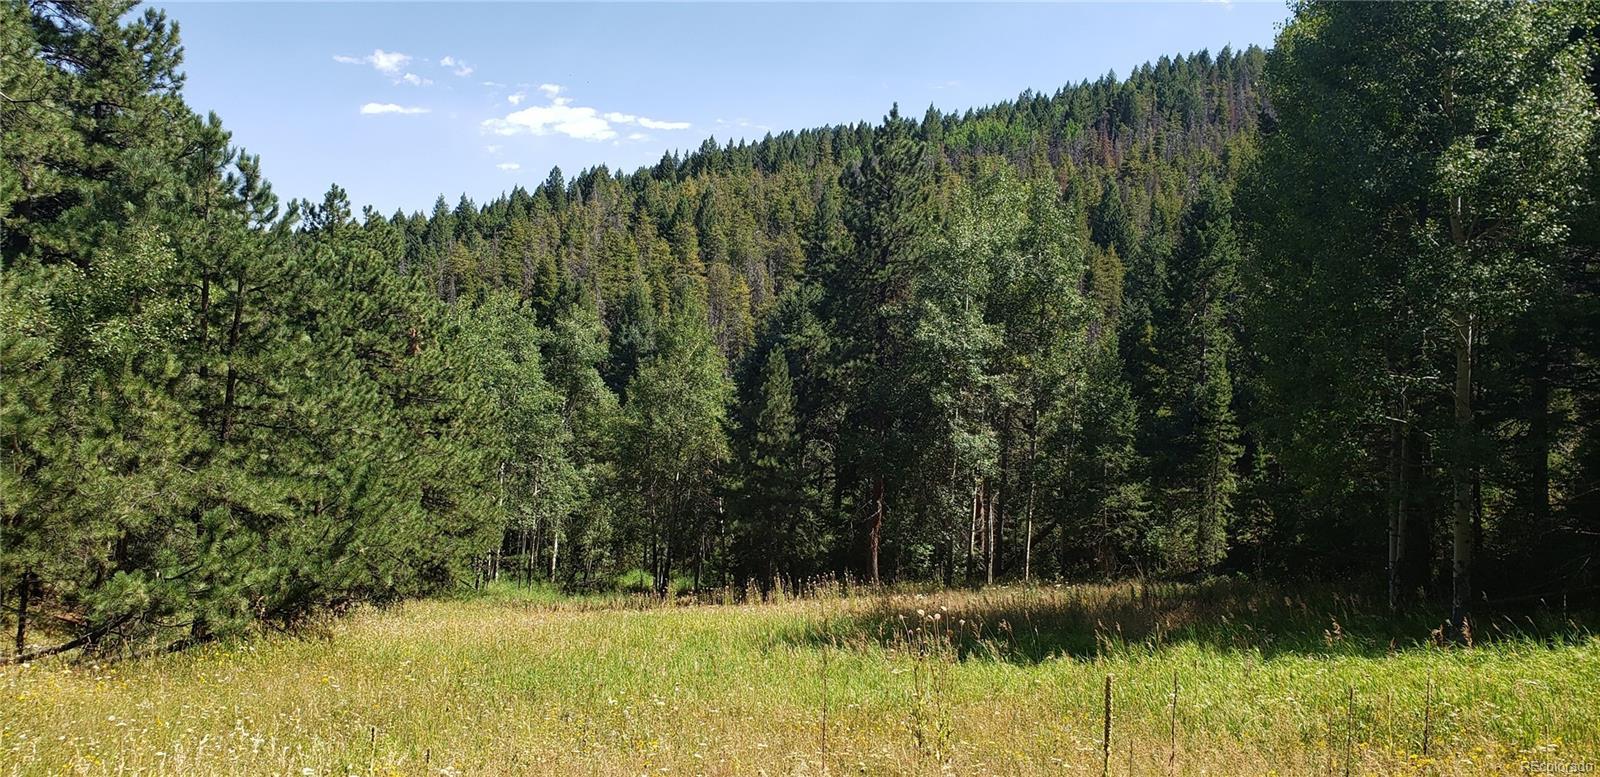 00 Indian Springs Road, Conifer, CO 80433 - Conifer, CO real estate listing